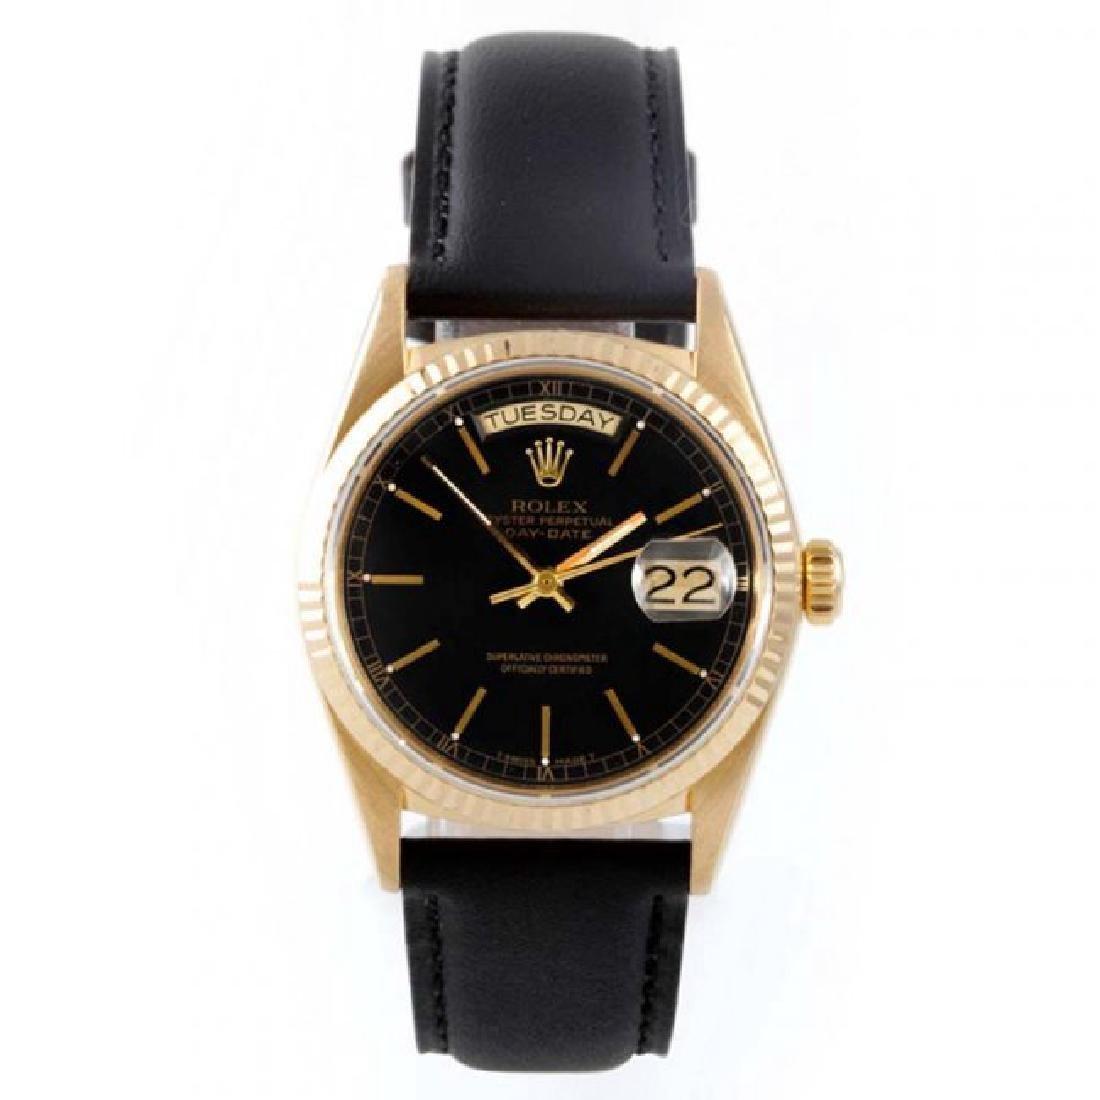 Rolex Men's 18K President Black Dial Watch